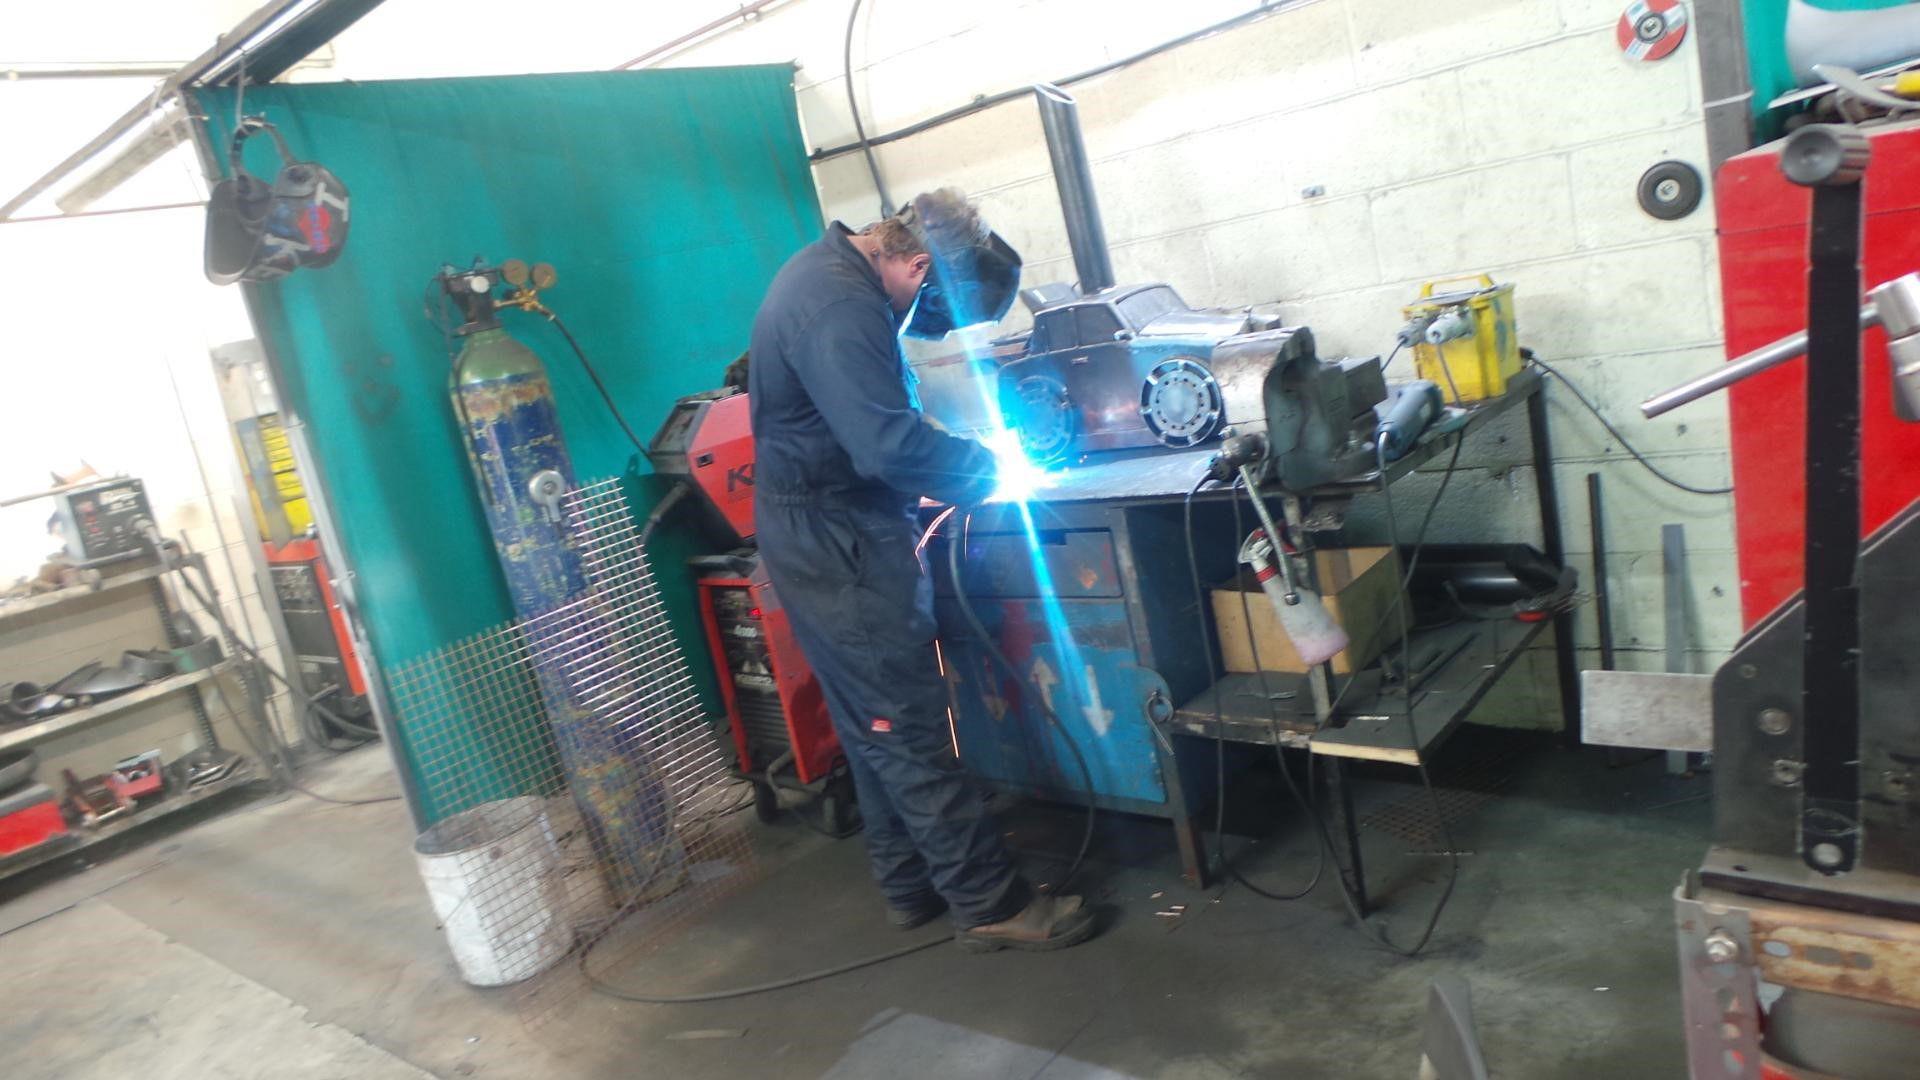 mechanic welding with equipment surrounding it